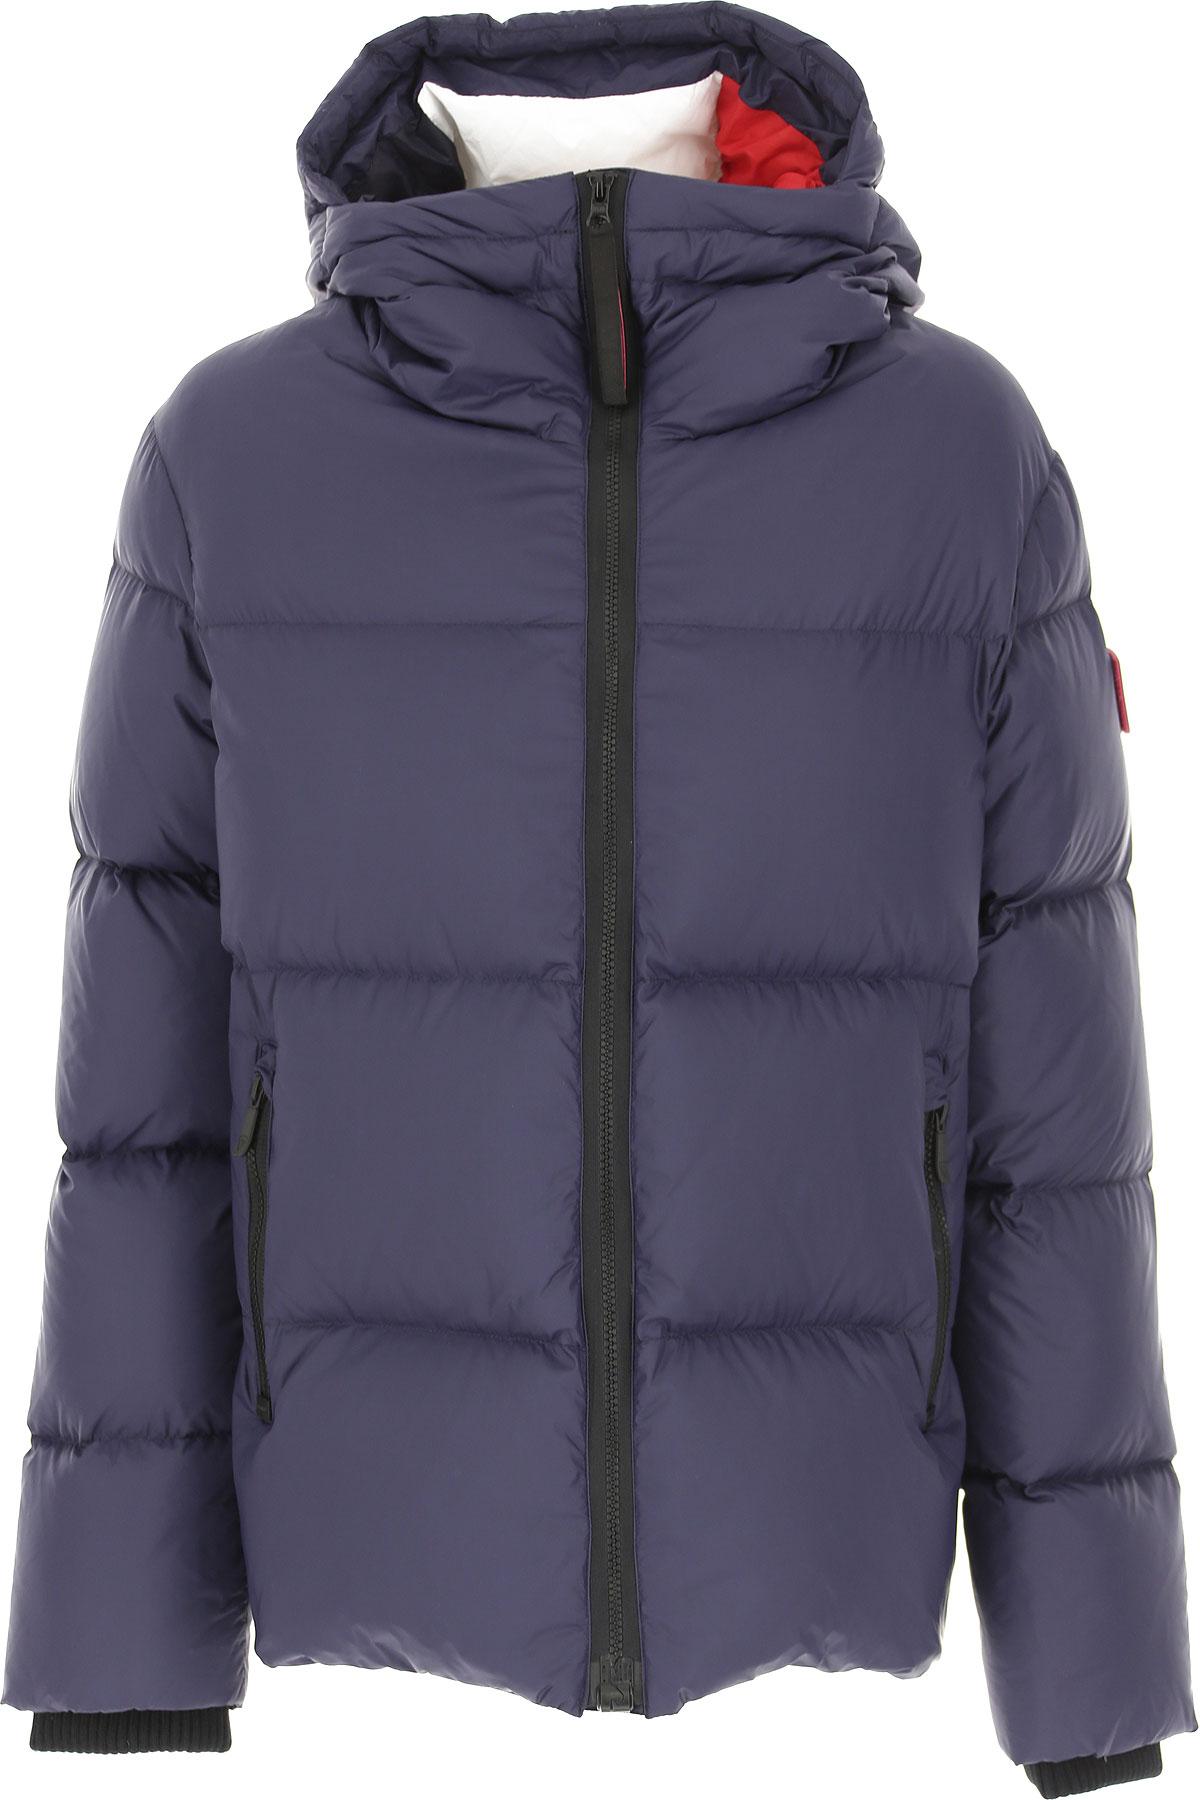 Rossignol Down Jacket for Women, Puffer Ski Jacket On Sale, Blue Ink, polyamide, 2019, 4 6 8